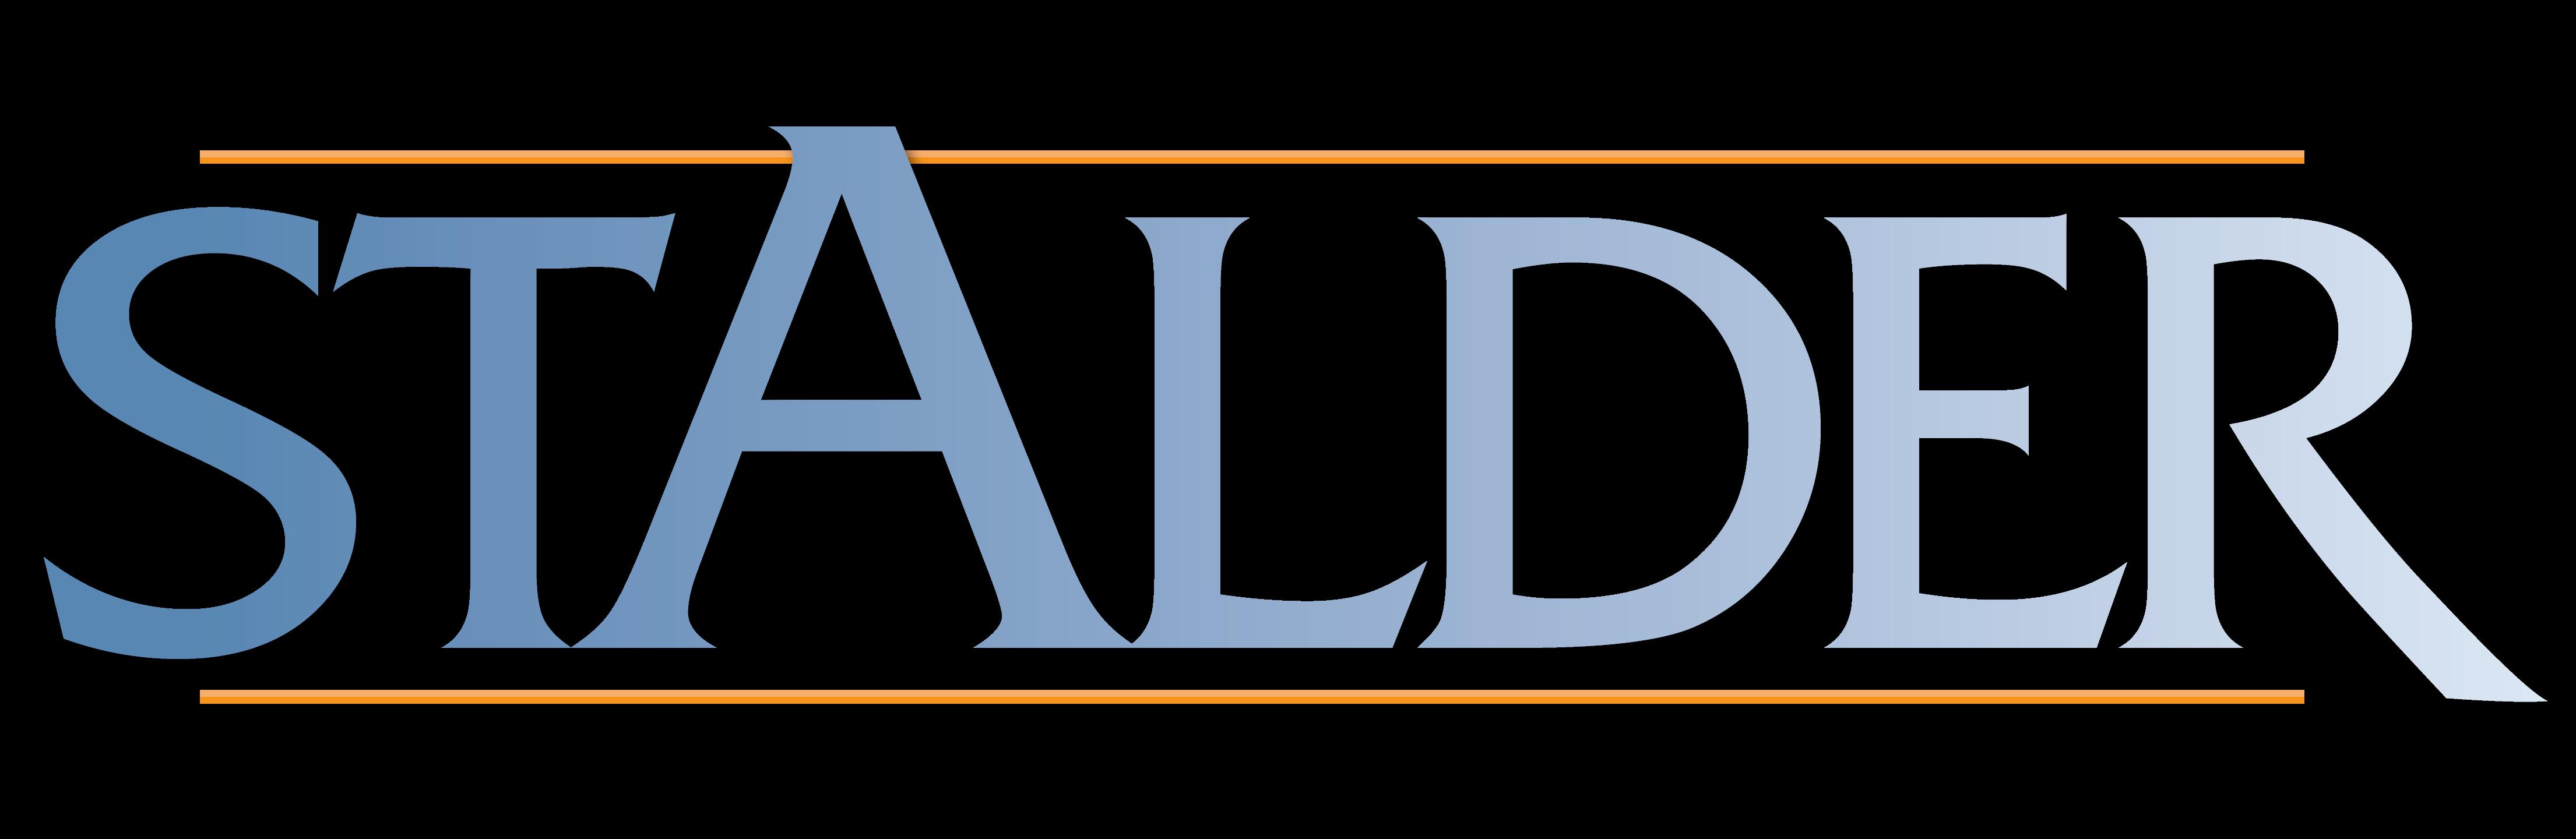 logo stalder